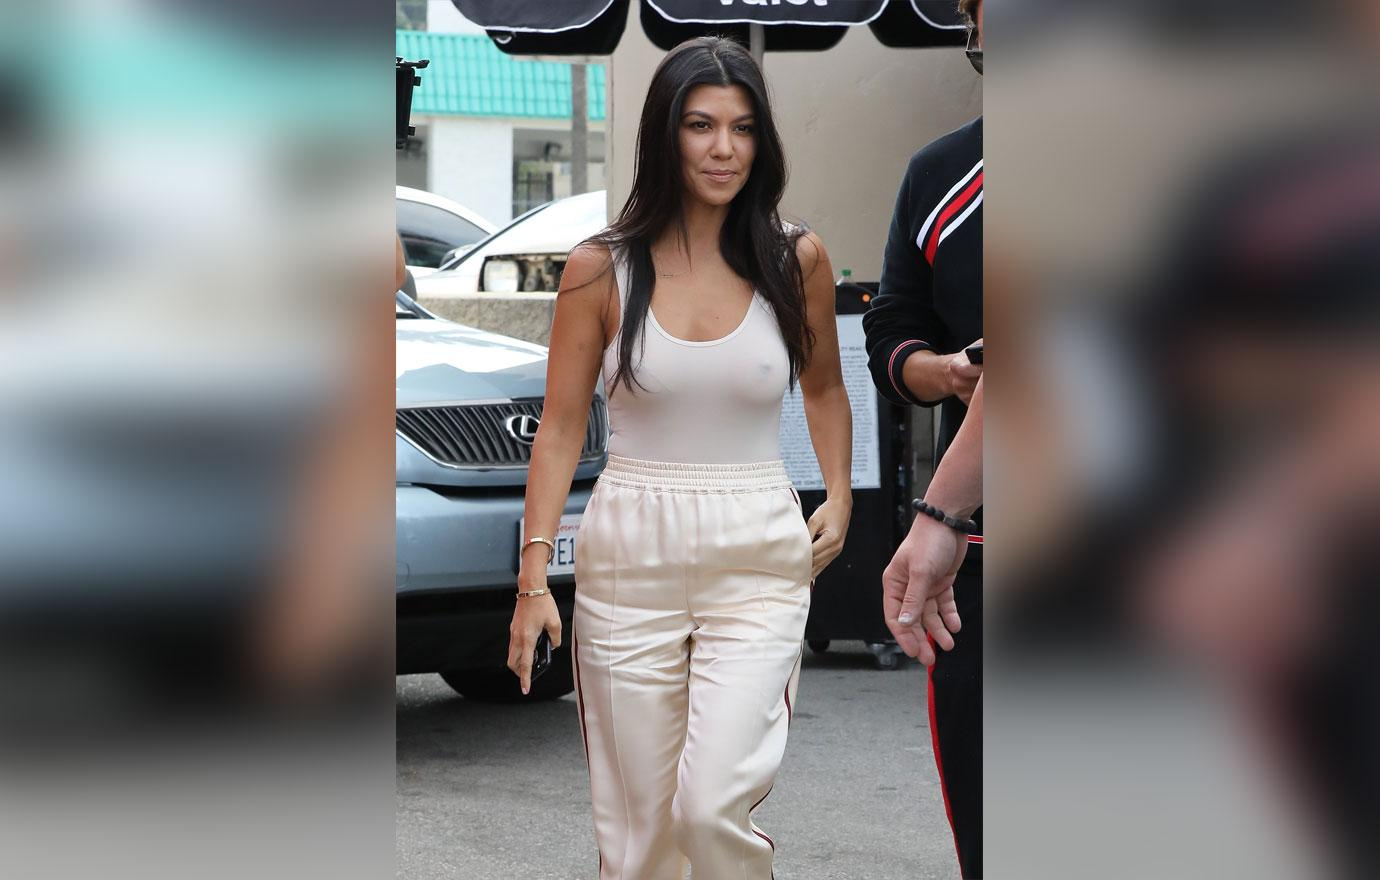 [PICS] Braless Kourtney Kardashian Bares Nipples While